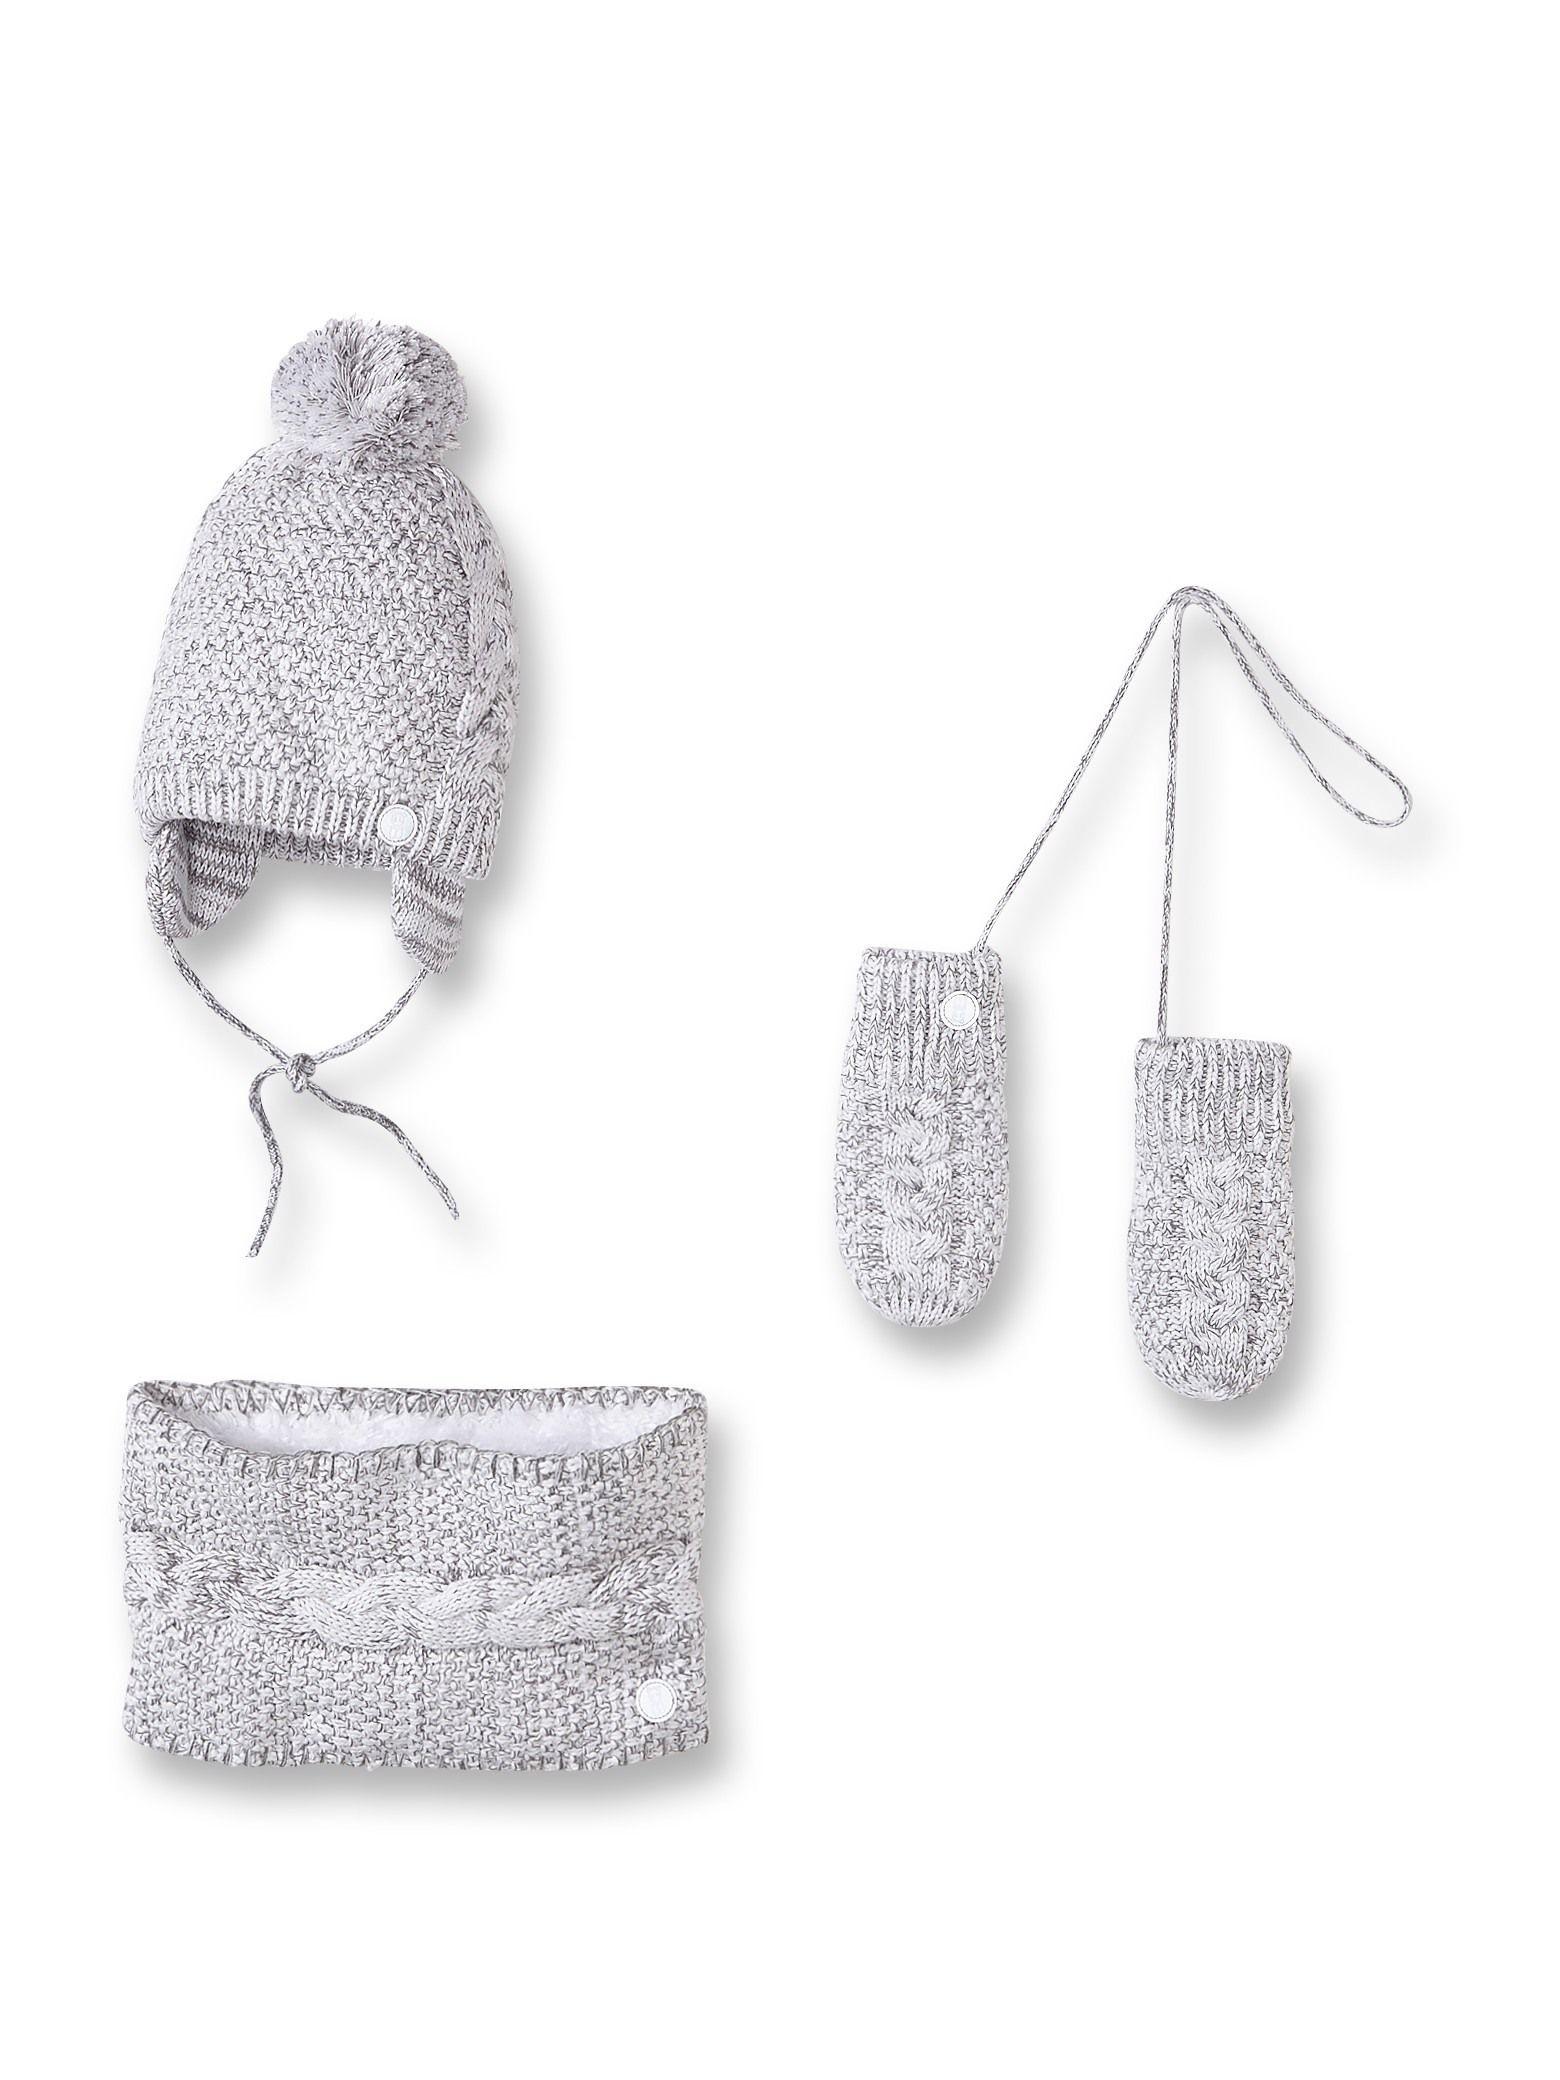 6f4526e9968 Lot accessoires chauds en tricot OKAIDI   Avis